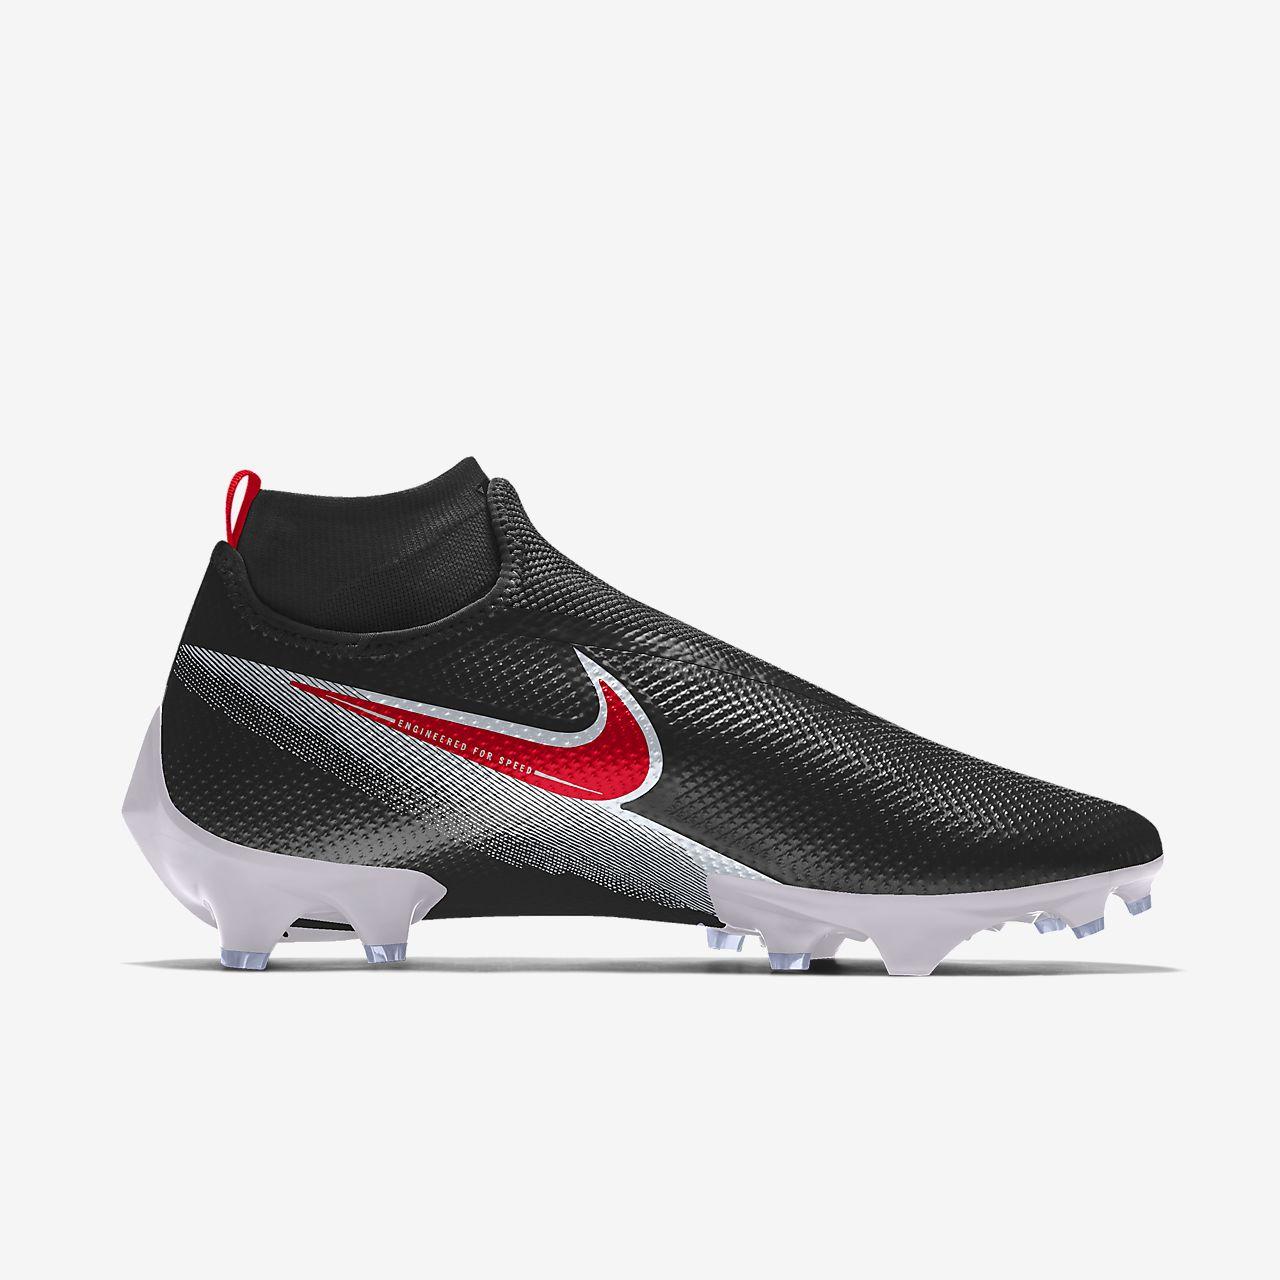 Nike Vapor Edge Pro 360 By You Custom American Football Boot